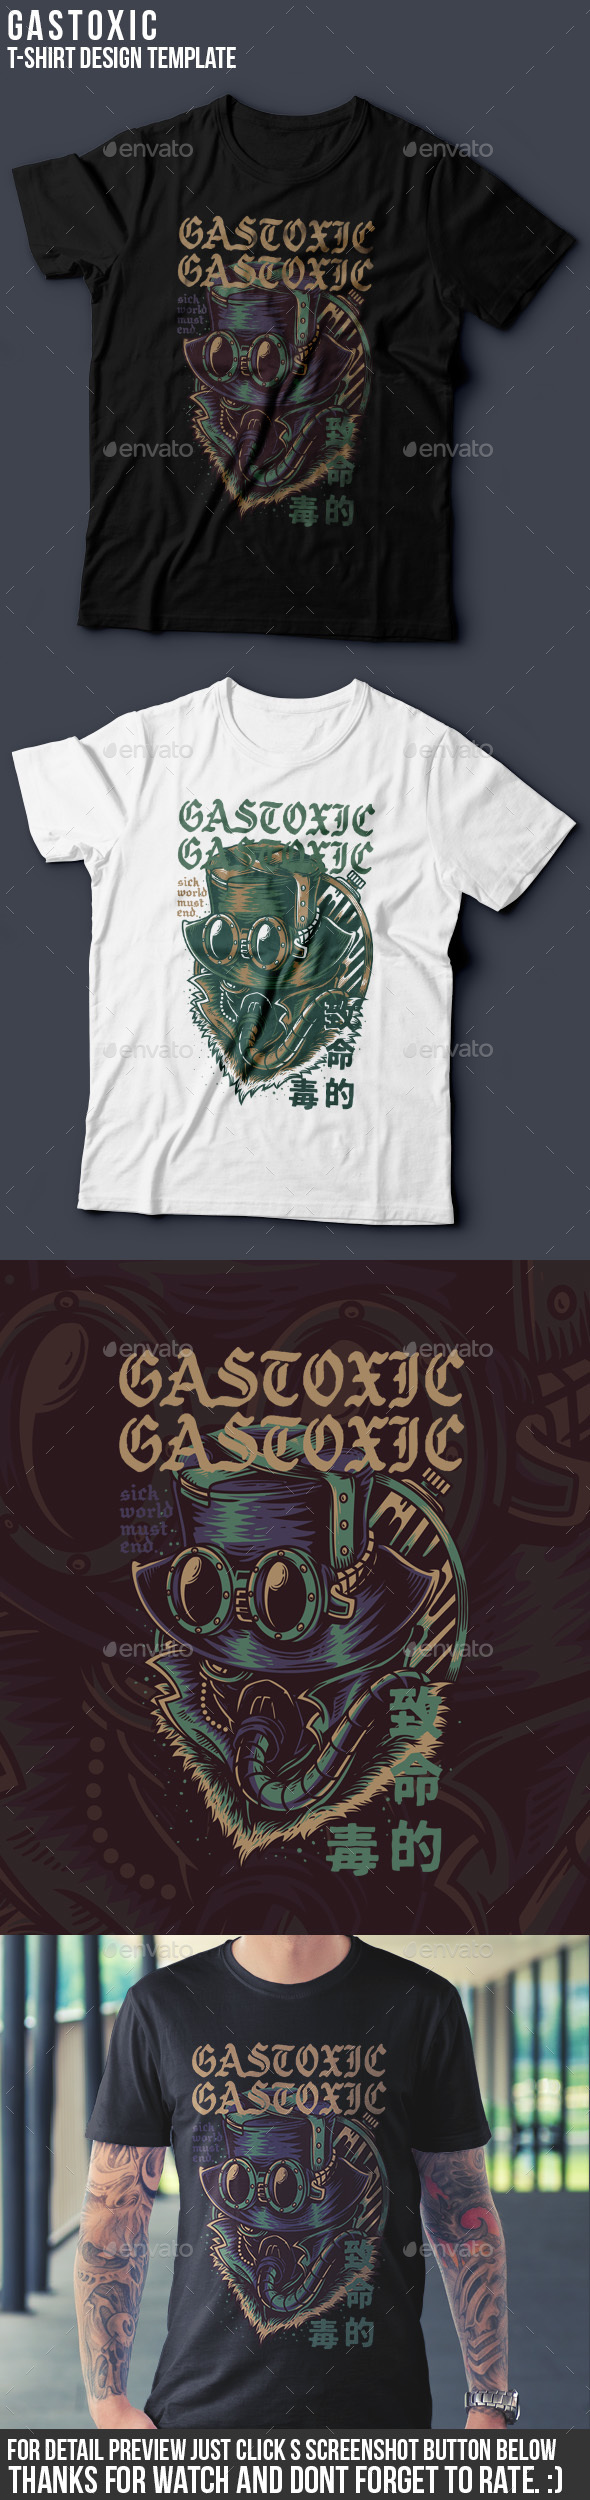 Gas Toxic T-Shirt Design